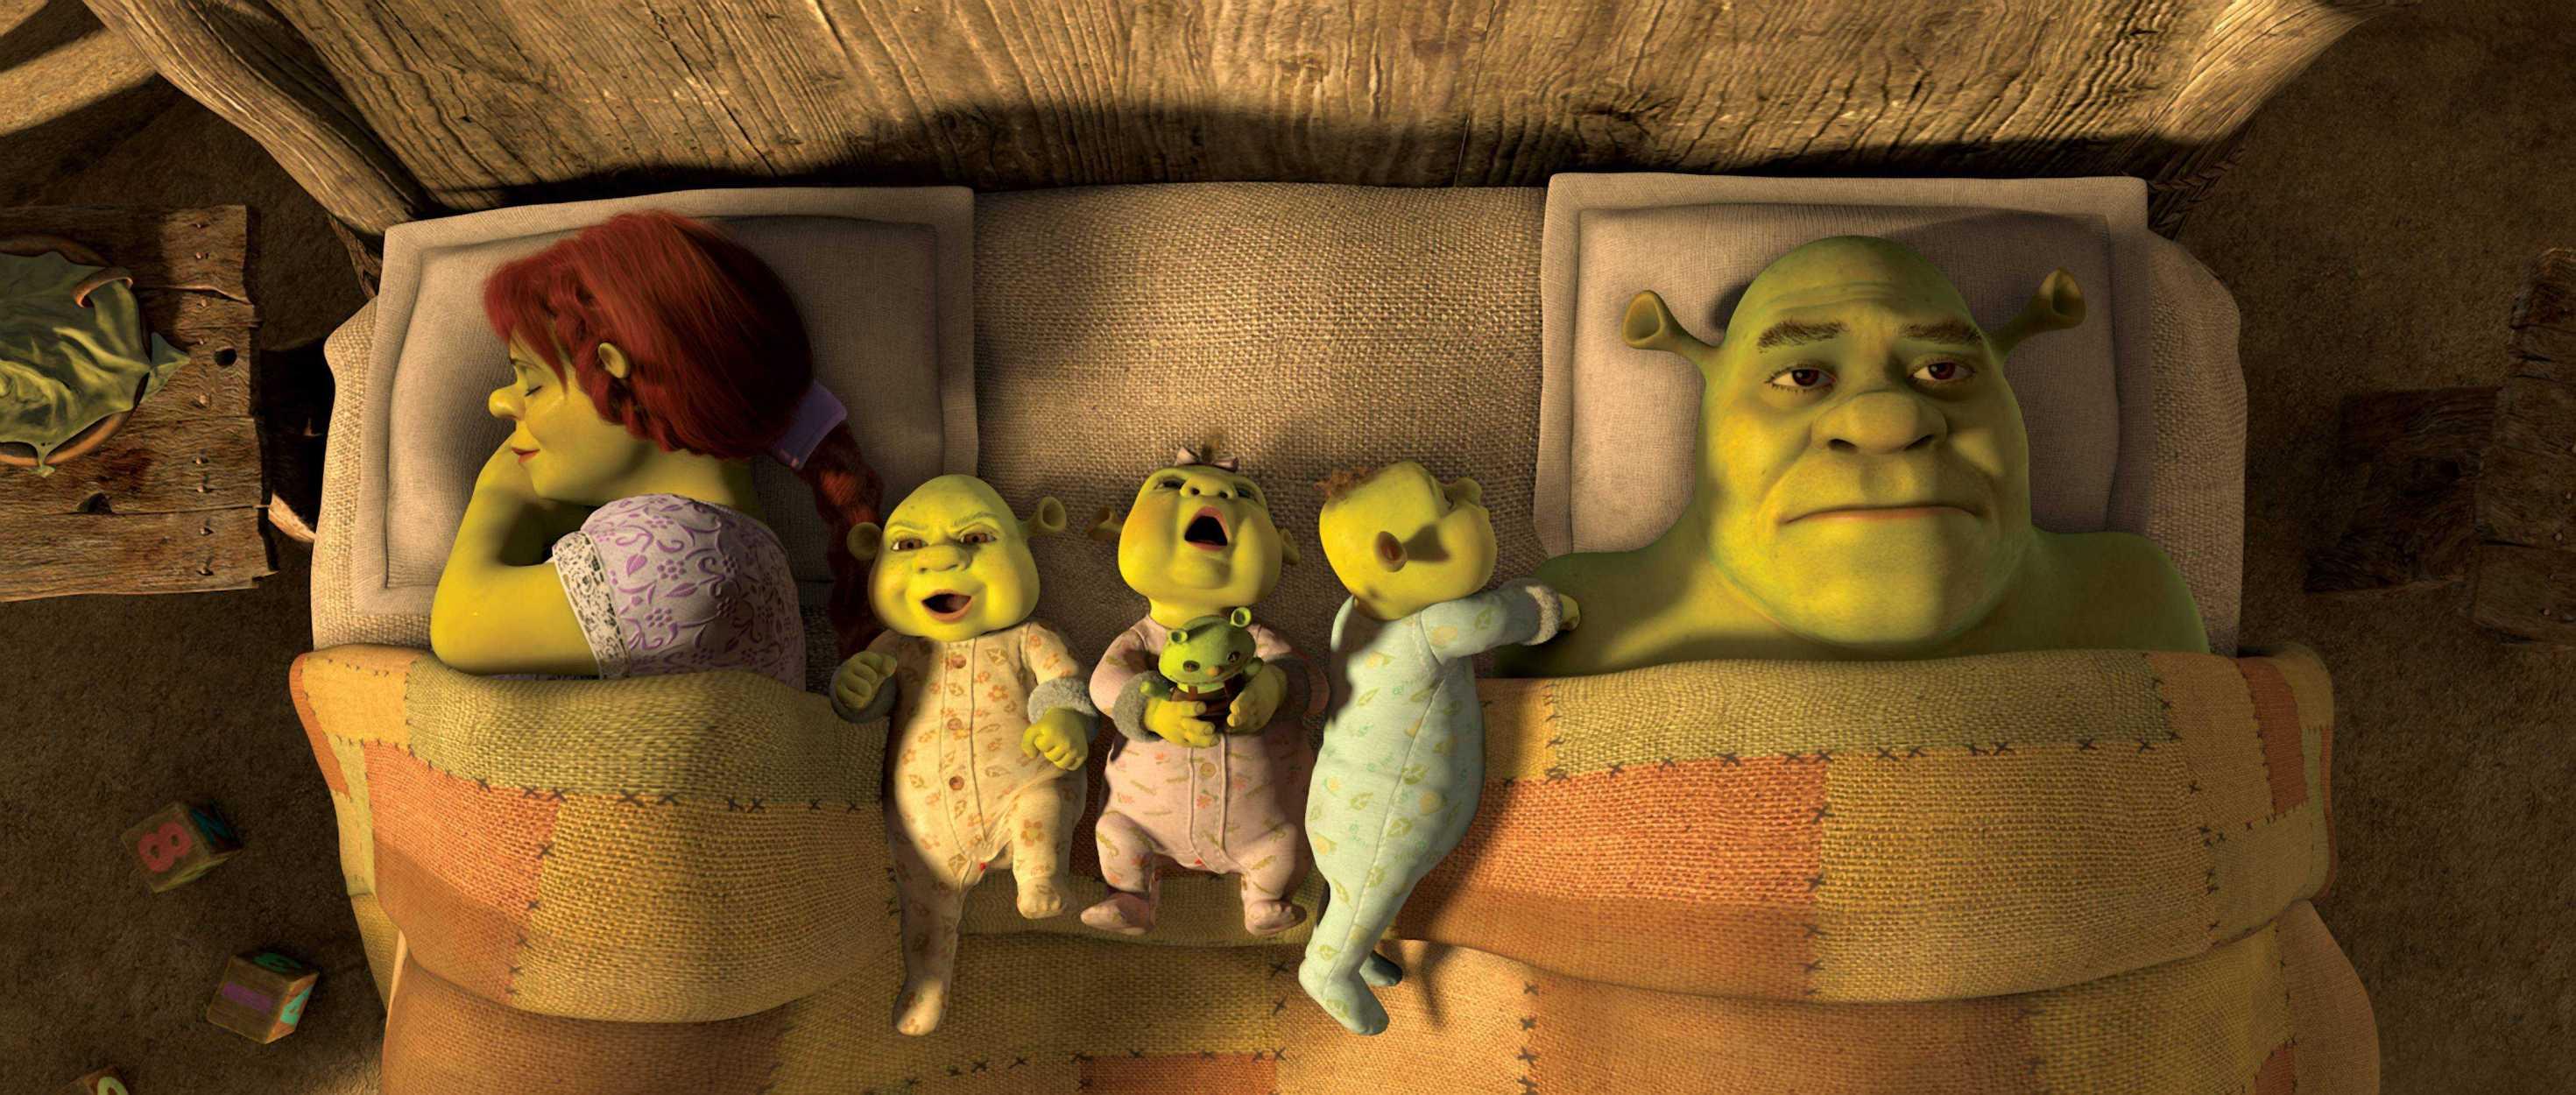 2010 Shrek Forever After Picture Wallpaper